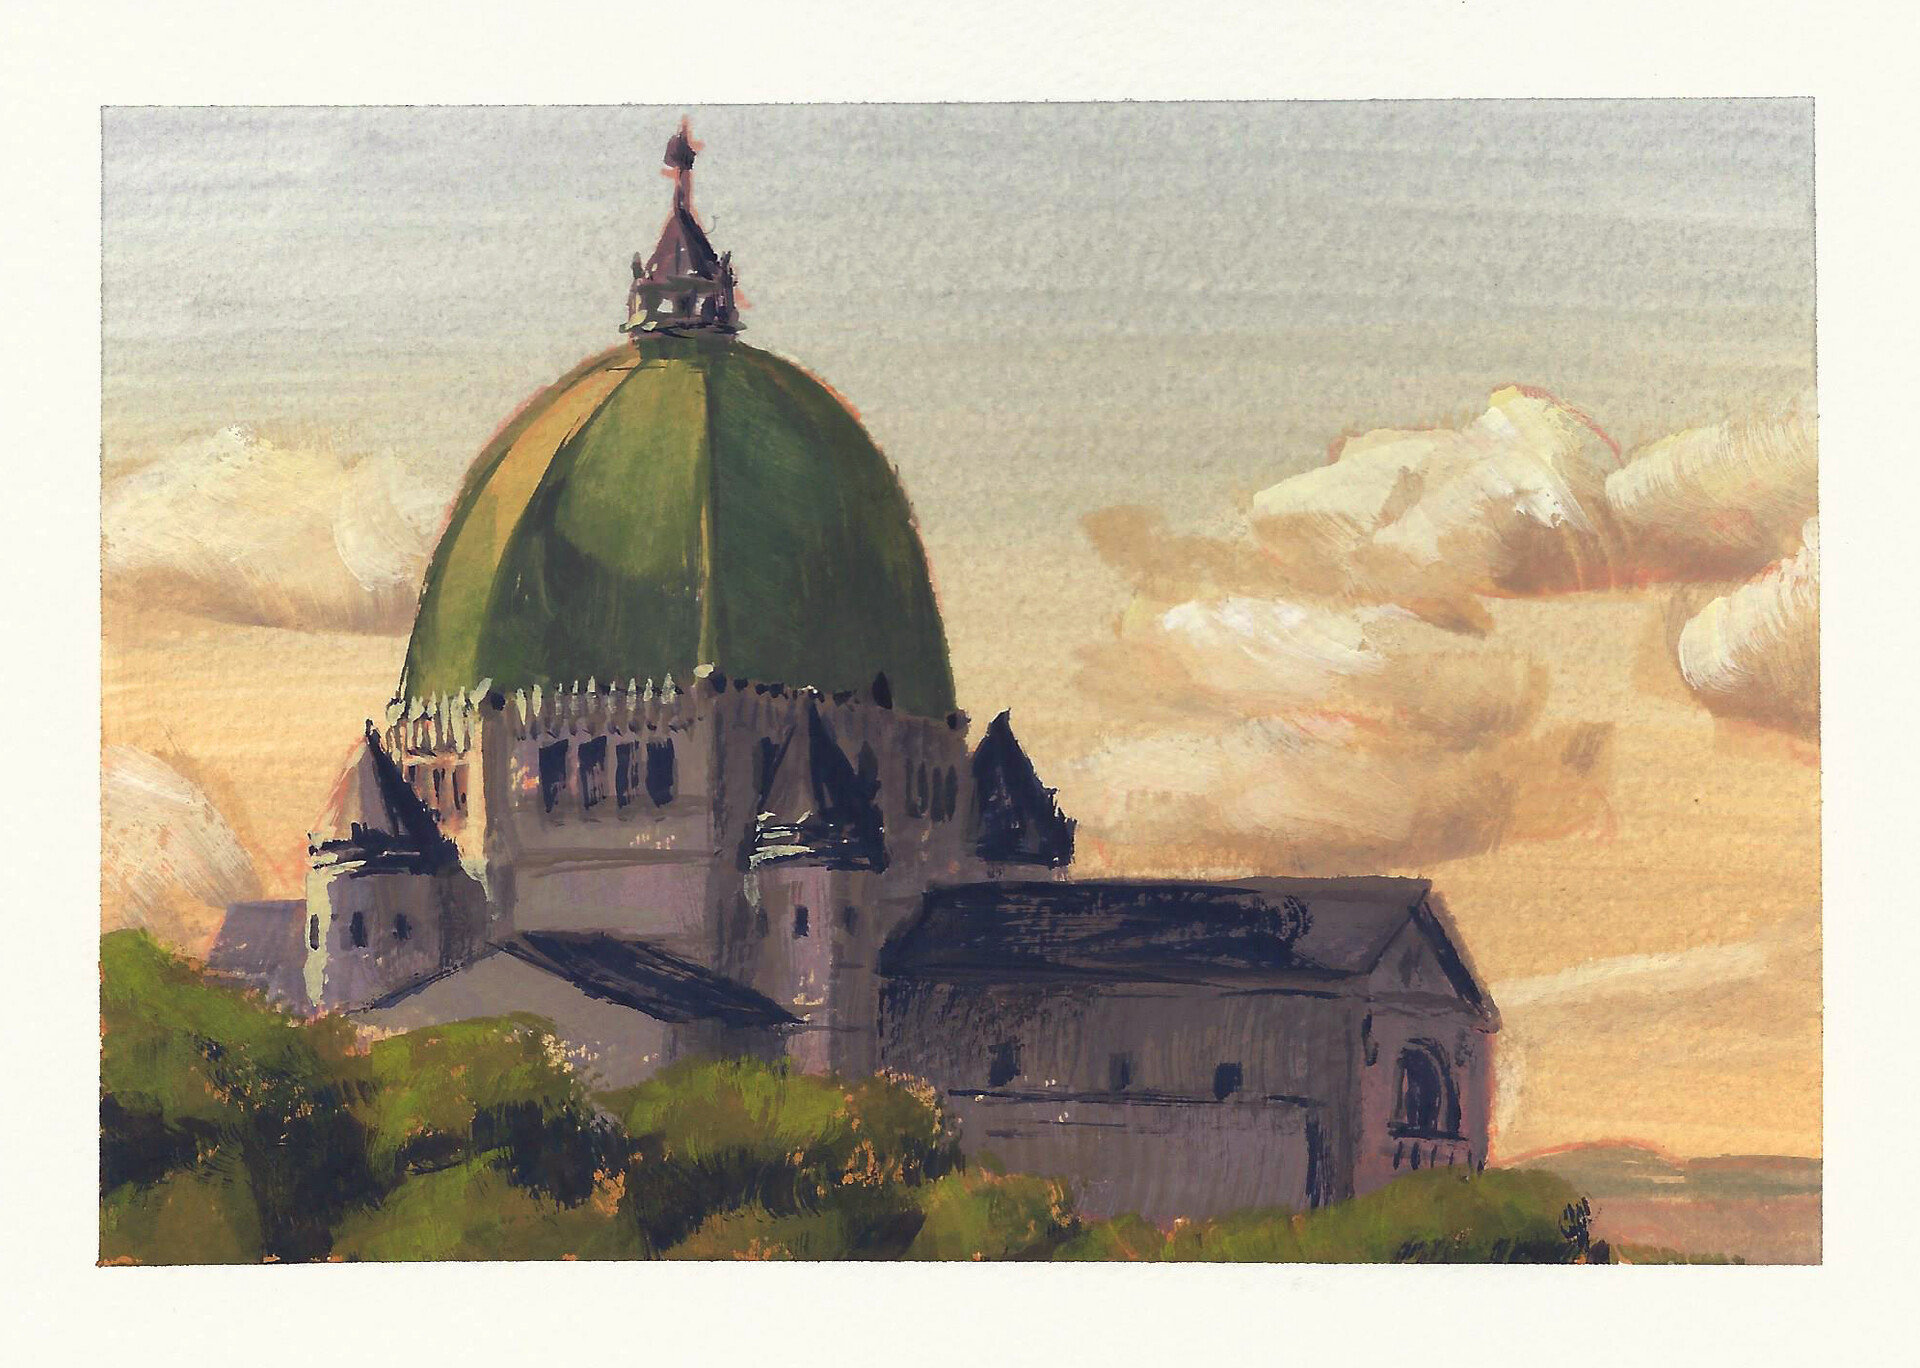 Commission of St Joseph's Oratory